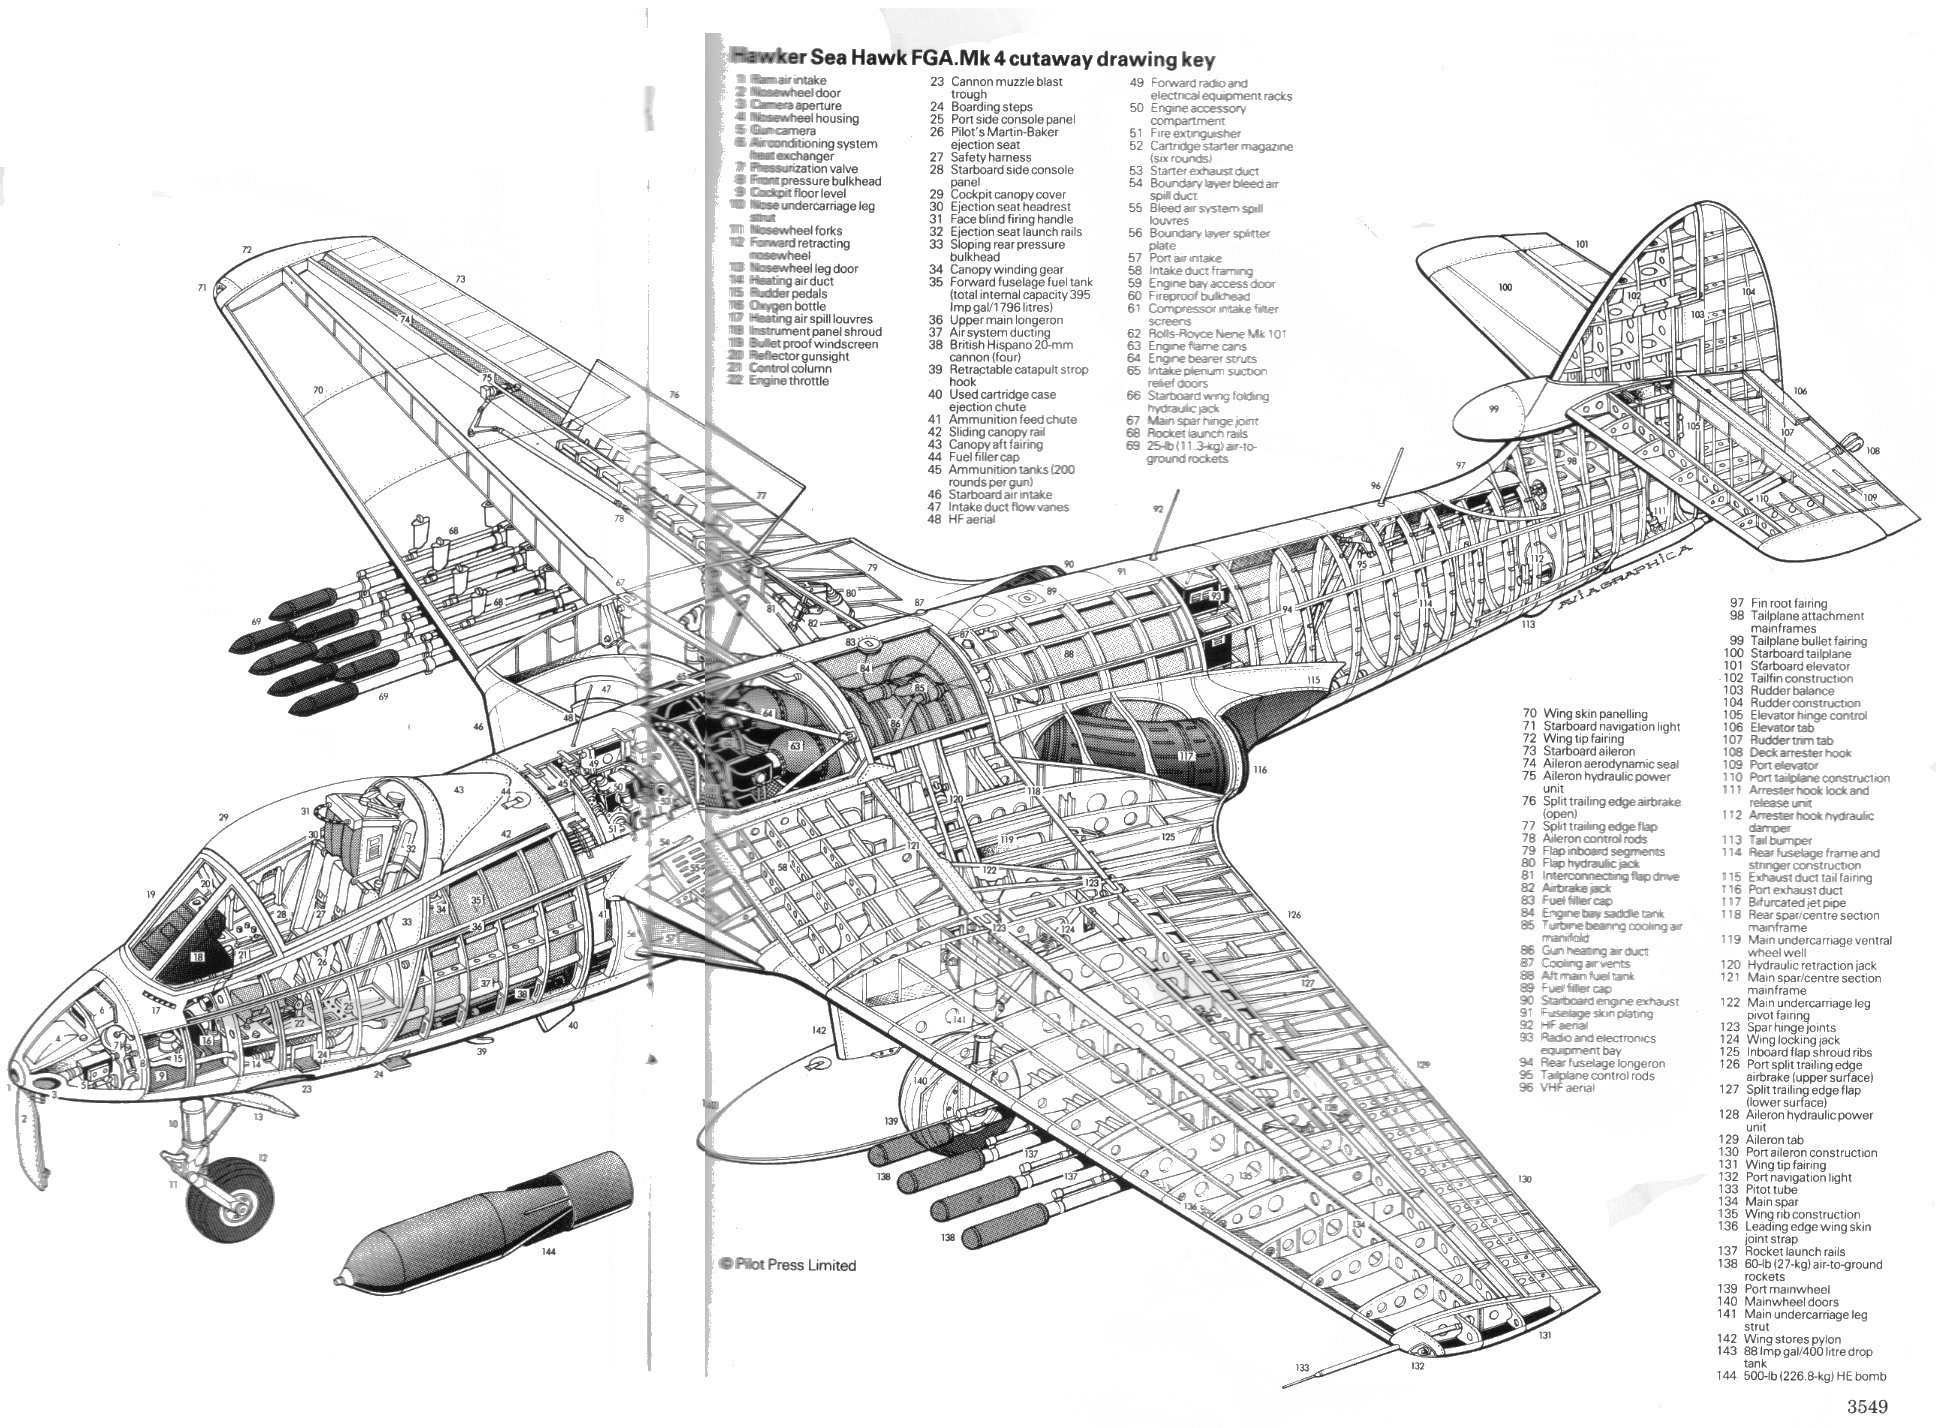 hight resolution of hawker sea hawk fga mk4 cutaway drawing key csc hercules c 130 schematic c 130 hercules 3 view